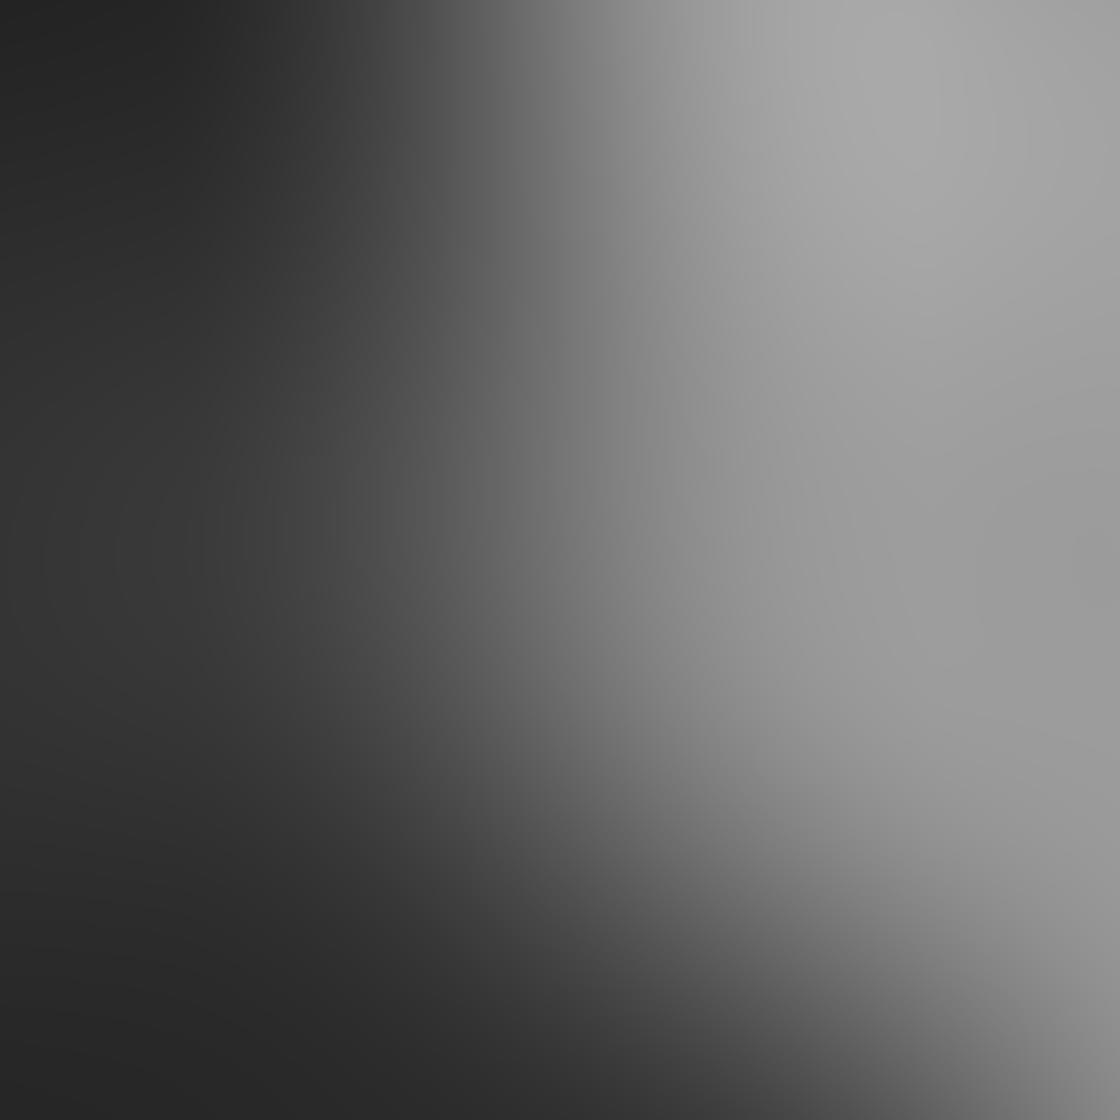 iPhone Photo Shadows 3